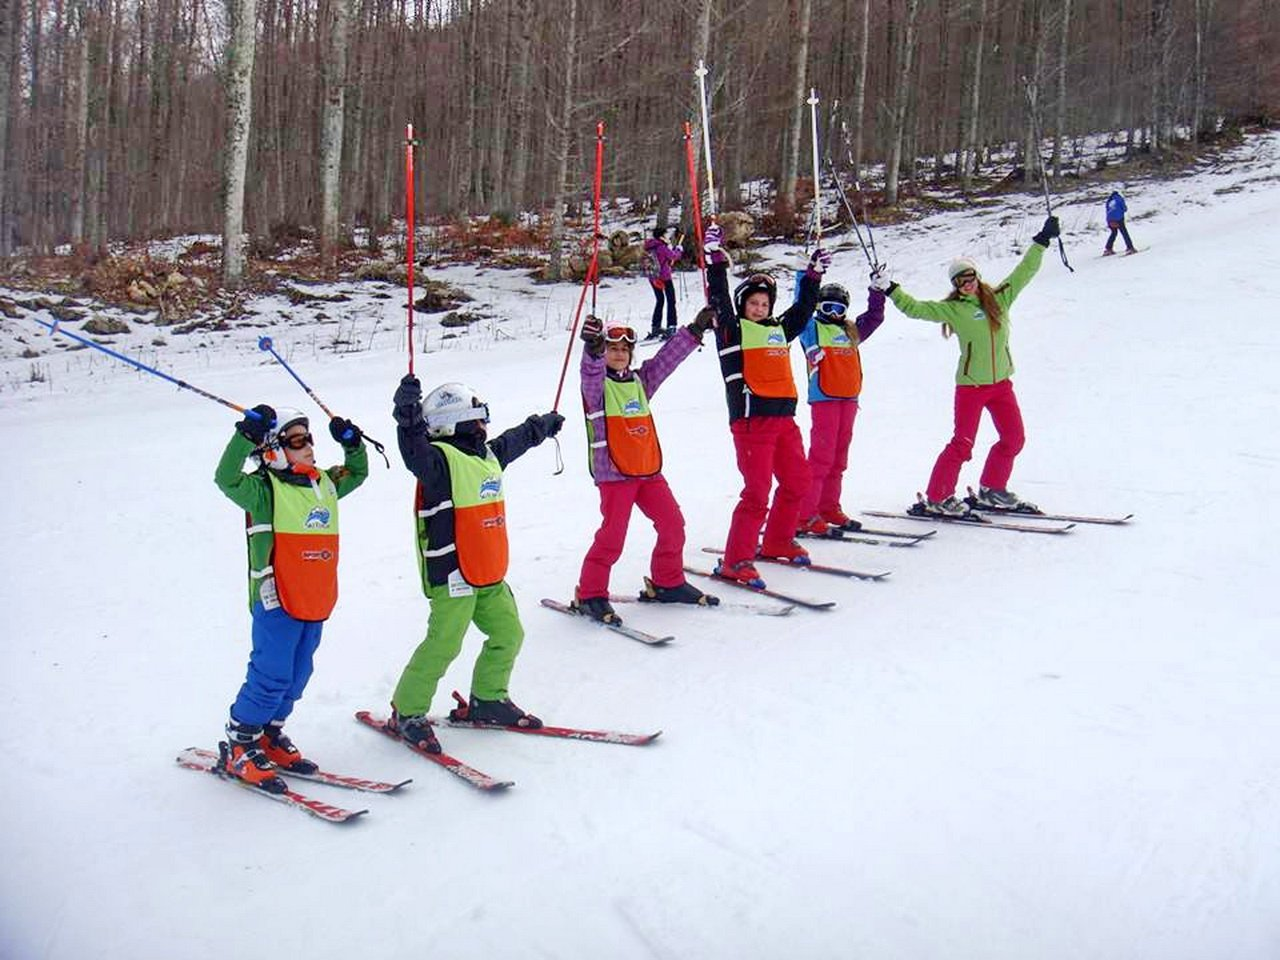 skiteam.gr-ski-academy-thessaloniki-2nd-weekend-18-19-january-2015-3-5-pigadiai-09